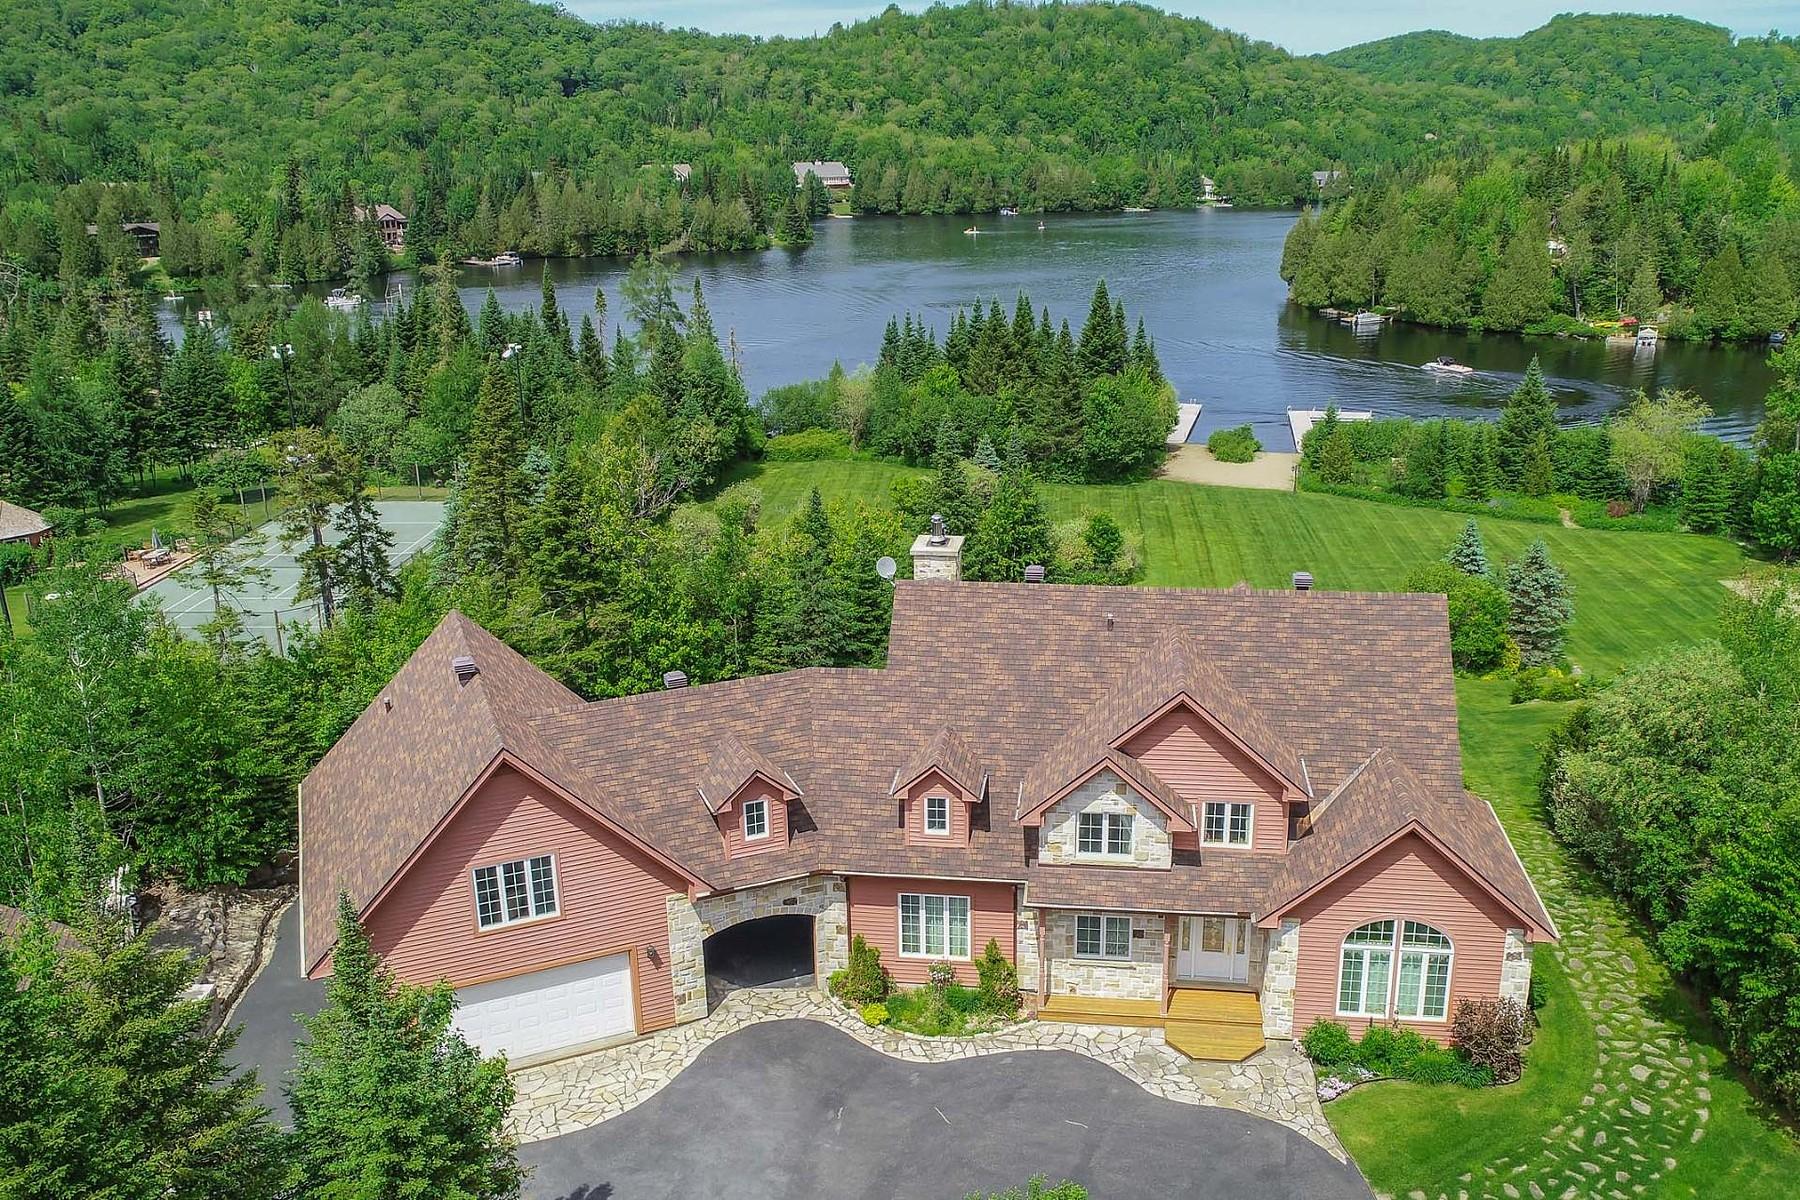 Single Family Homes for Sale at Saint-Adolphe-d'Howard, Laurentides 113 Ch. de Chenonceaux Saint-Adolphe-D'howard, Quebec J0T2B0 Canada